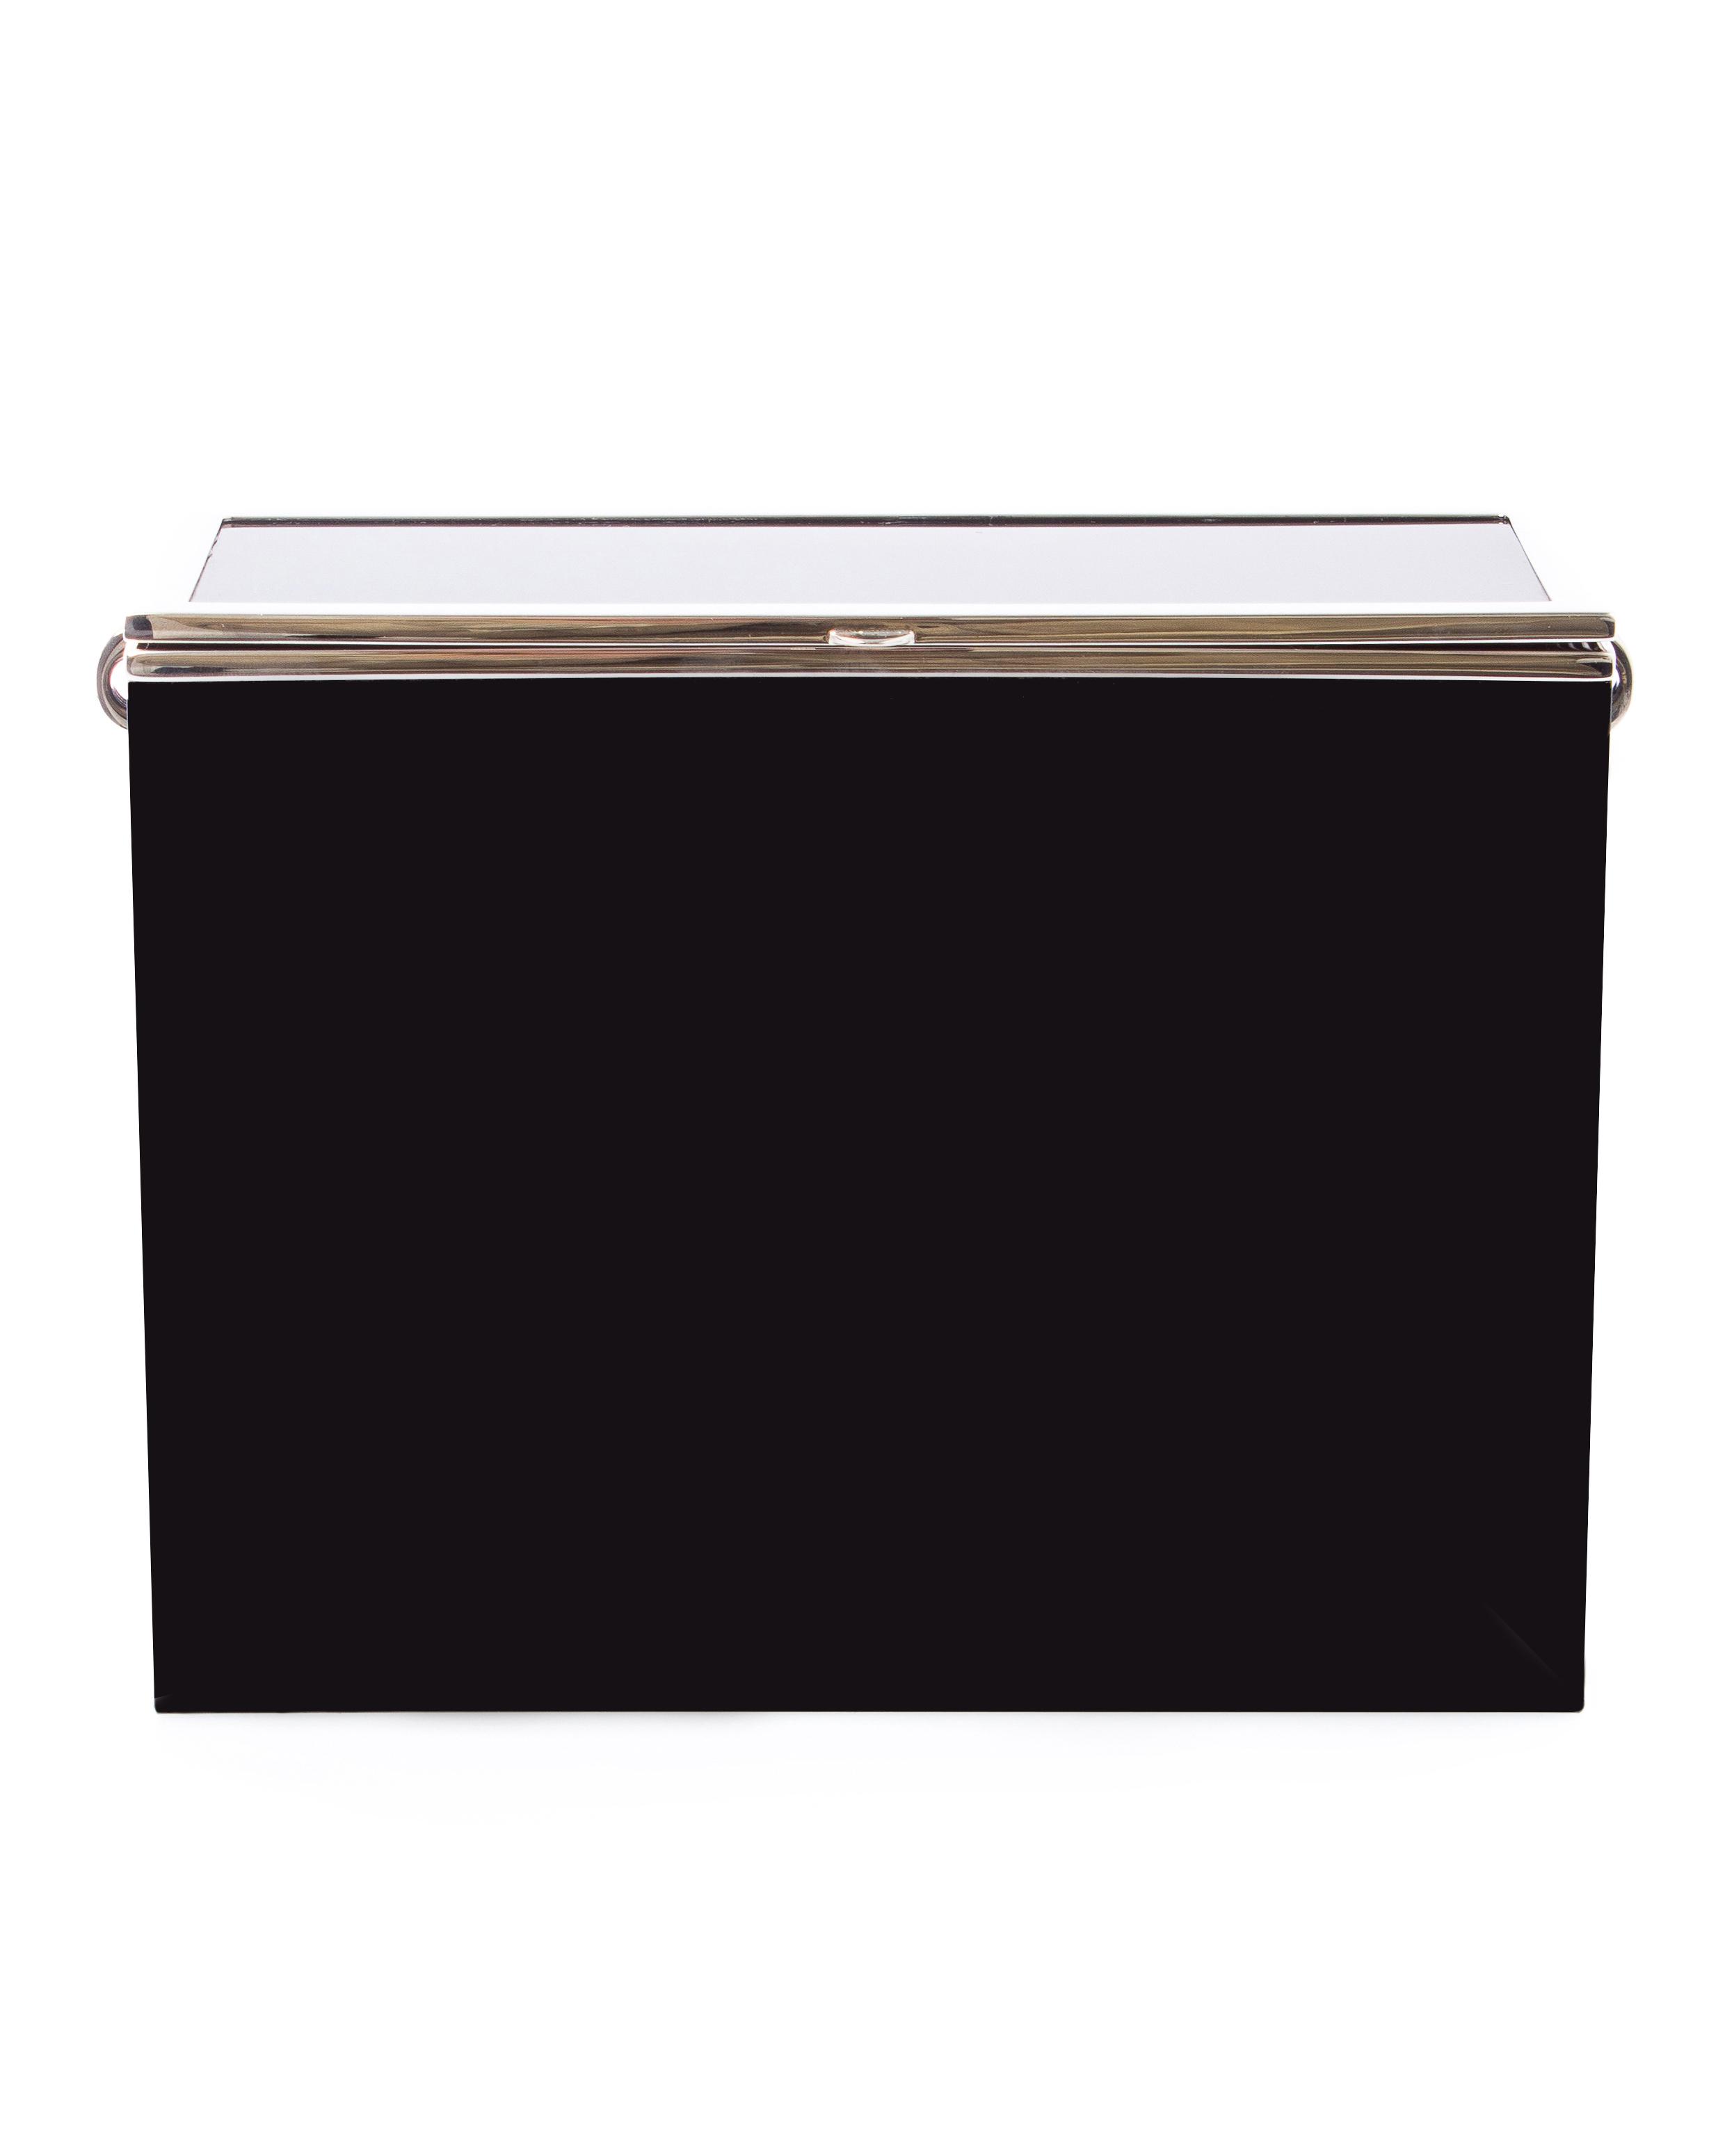 MARINA RAPHAEL JEWEL BOX в армированном каркасе  артикул  марки MARINA RAPHAEL купить за 71500 руб.